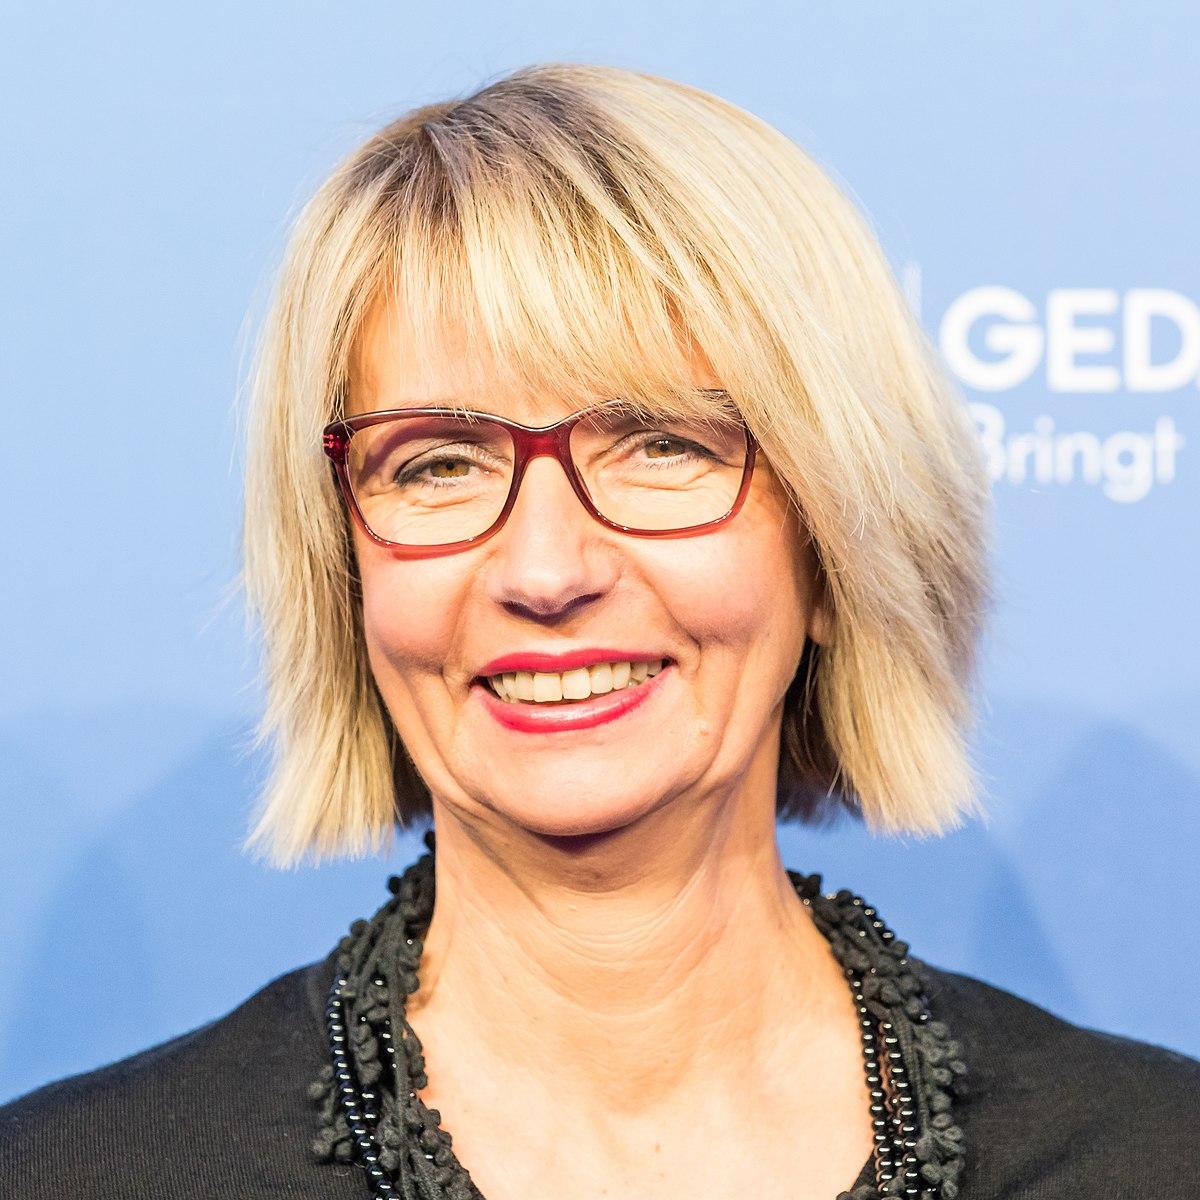 Martina Eßer - Wikipedia